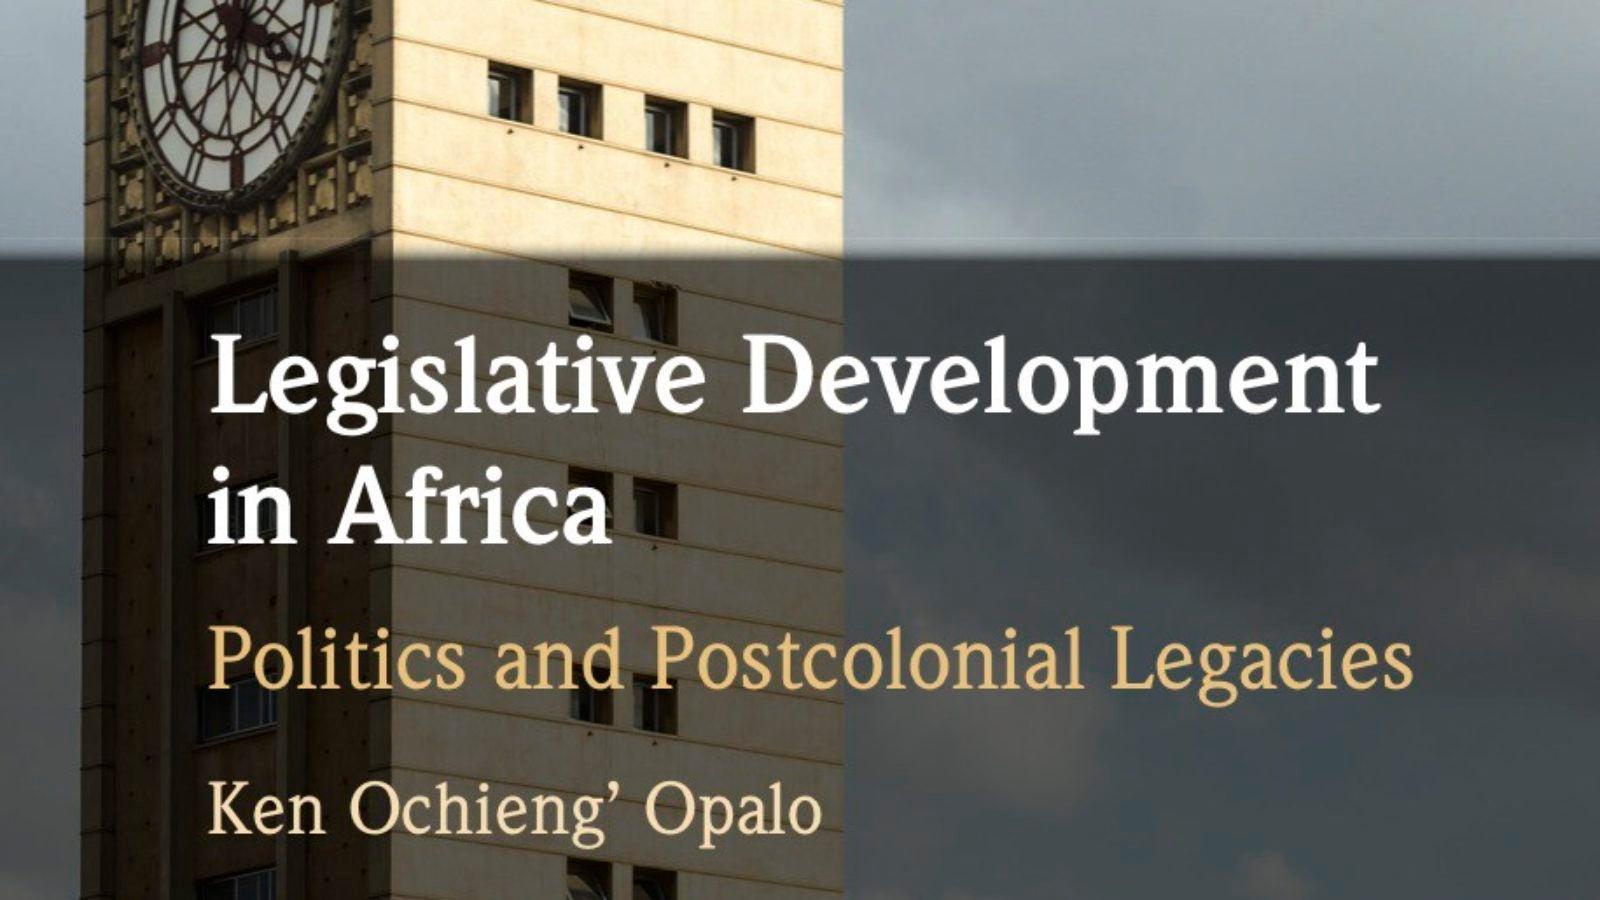 Bookcover for Legislative Development in Africa